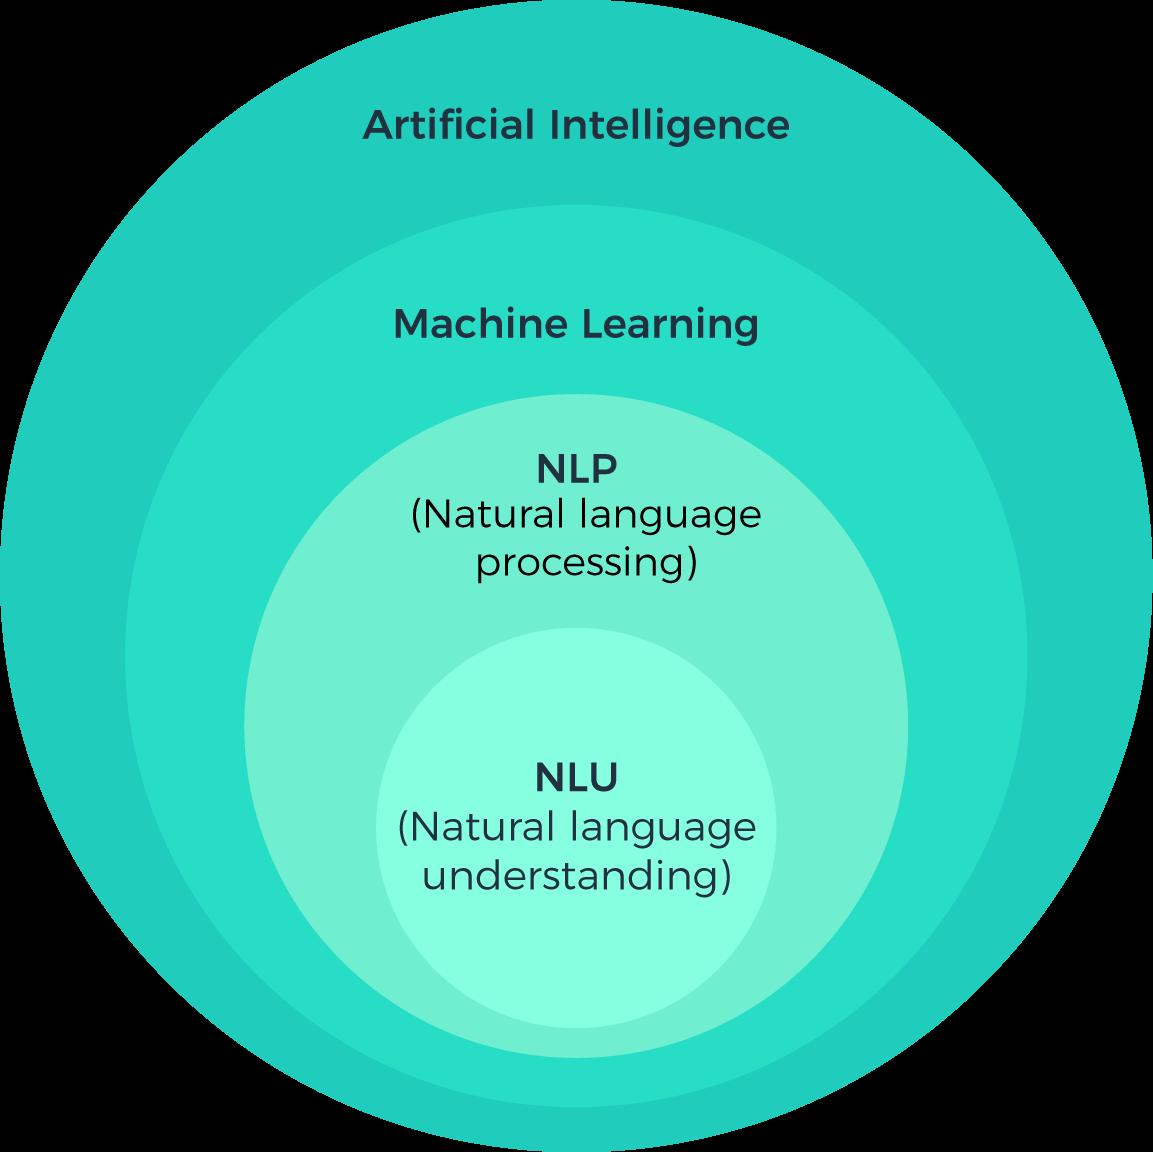 Agatha is build on AI based on NLU and NLP.